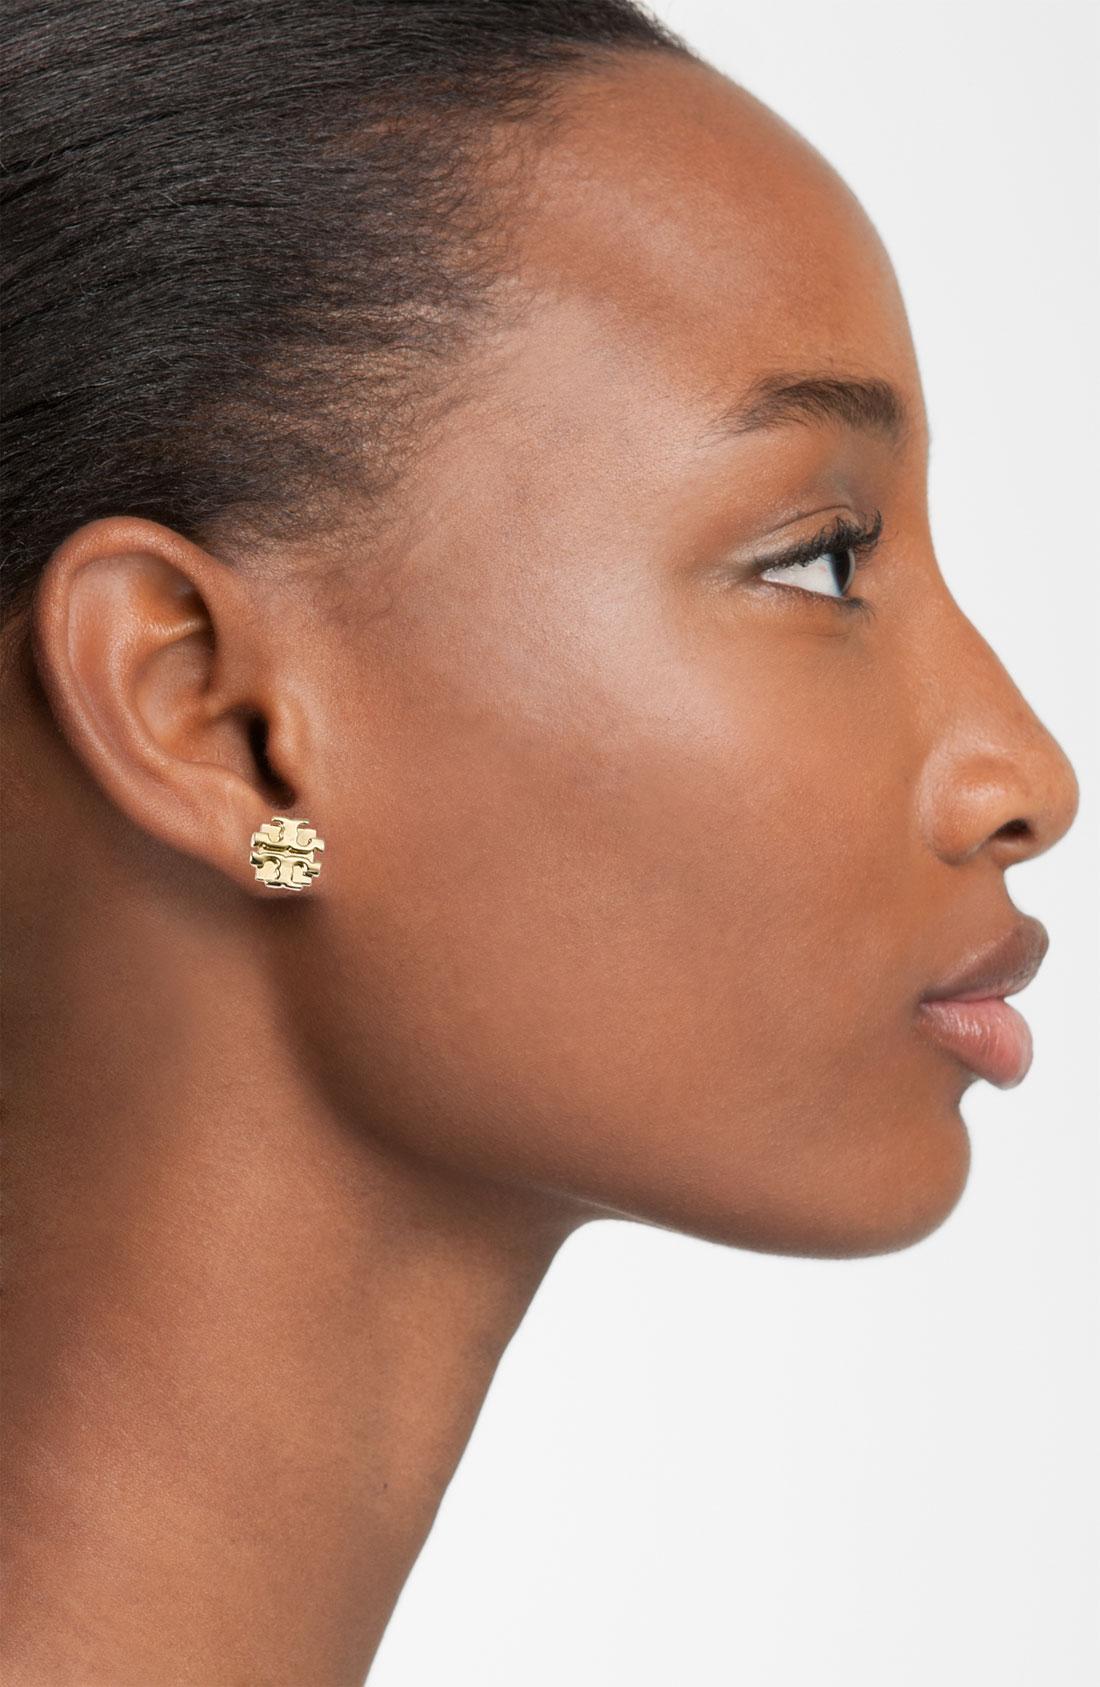 Tory Burch Logo Stud Earrings Cabochon Source Gallery